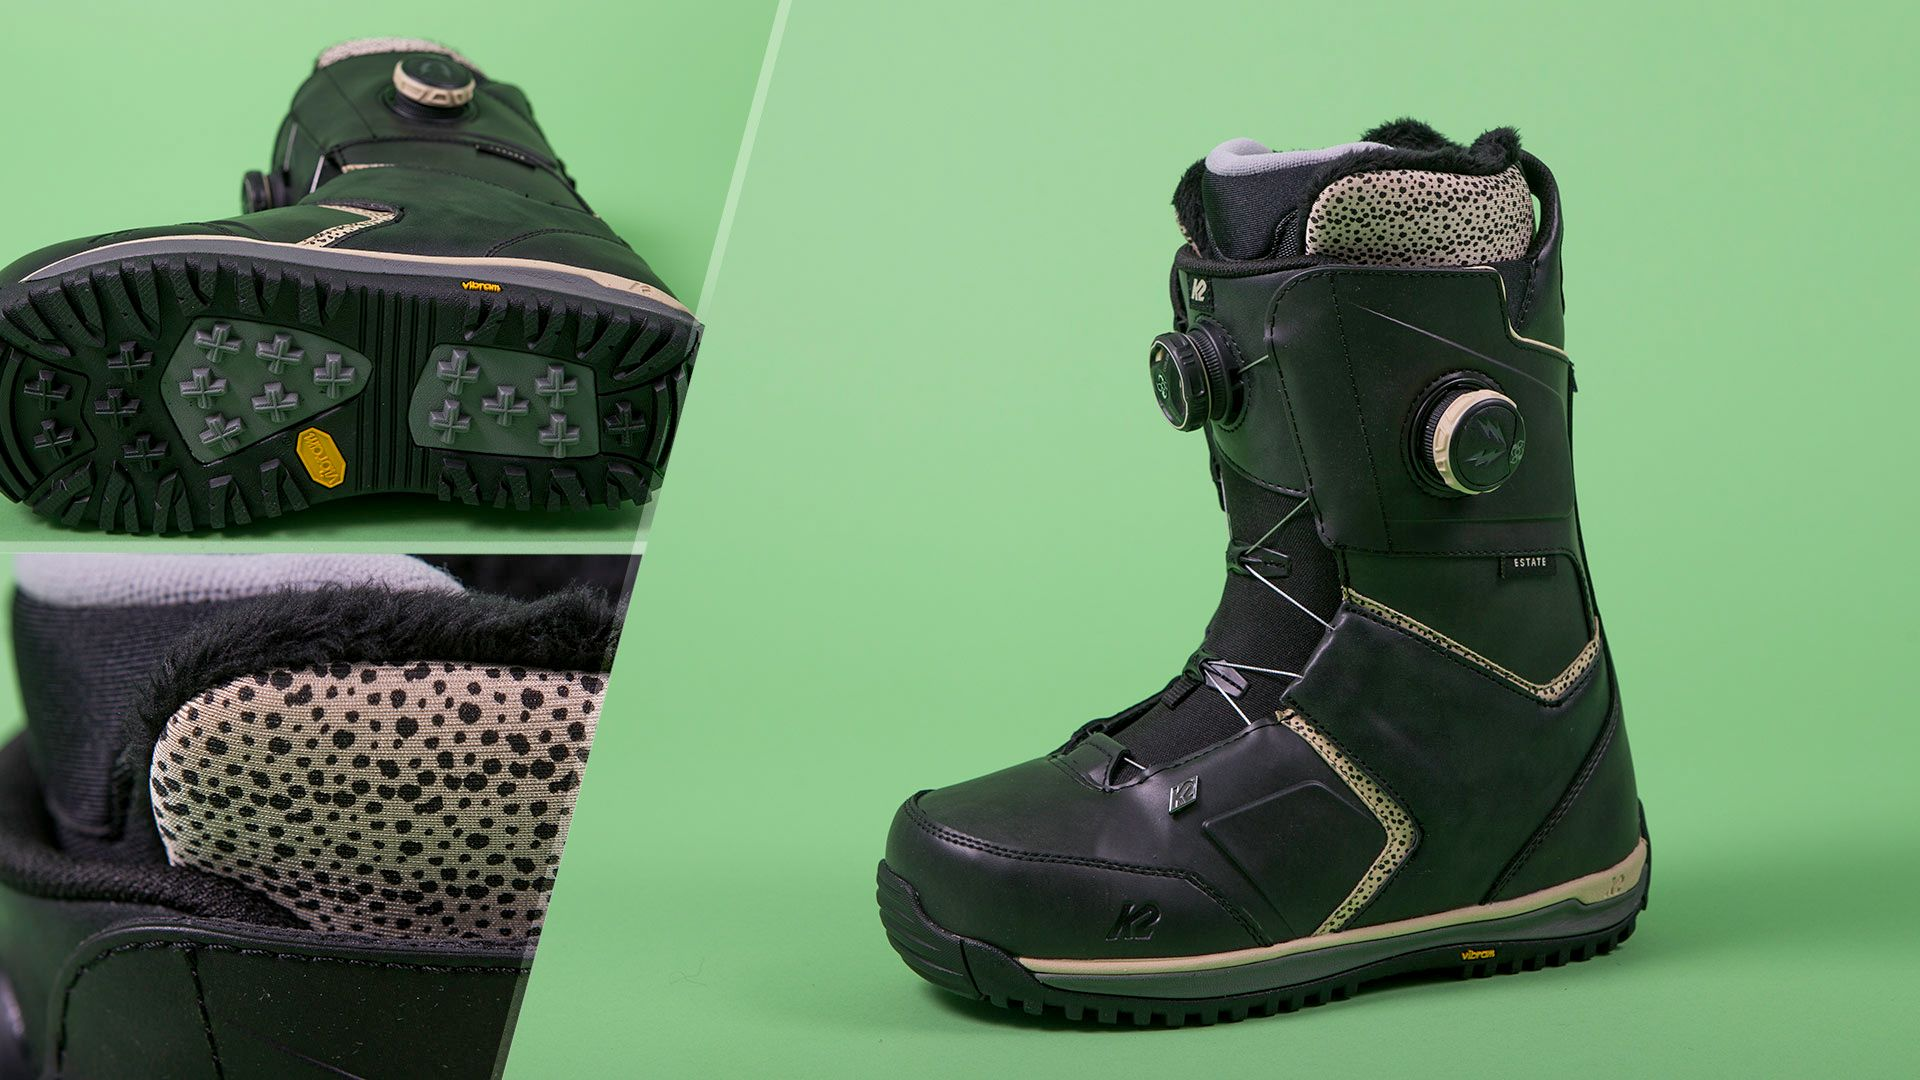 13 Best Women's Snowboard Boots 2016 2017 Whi